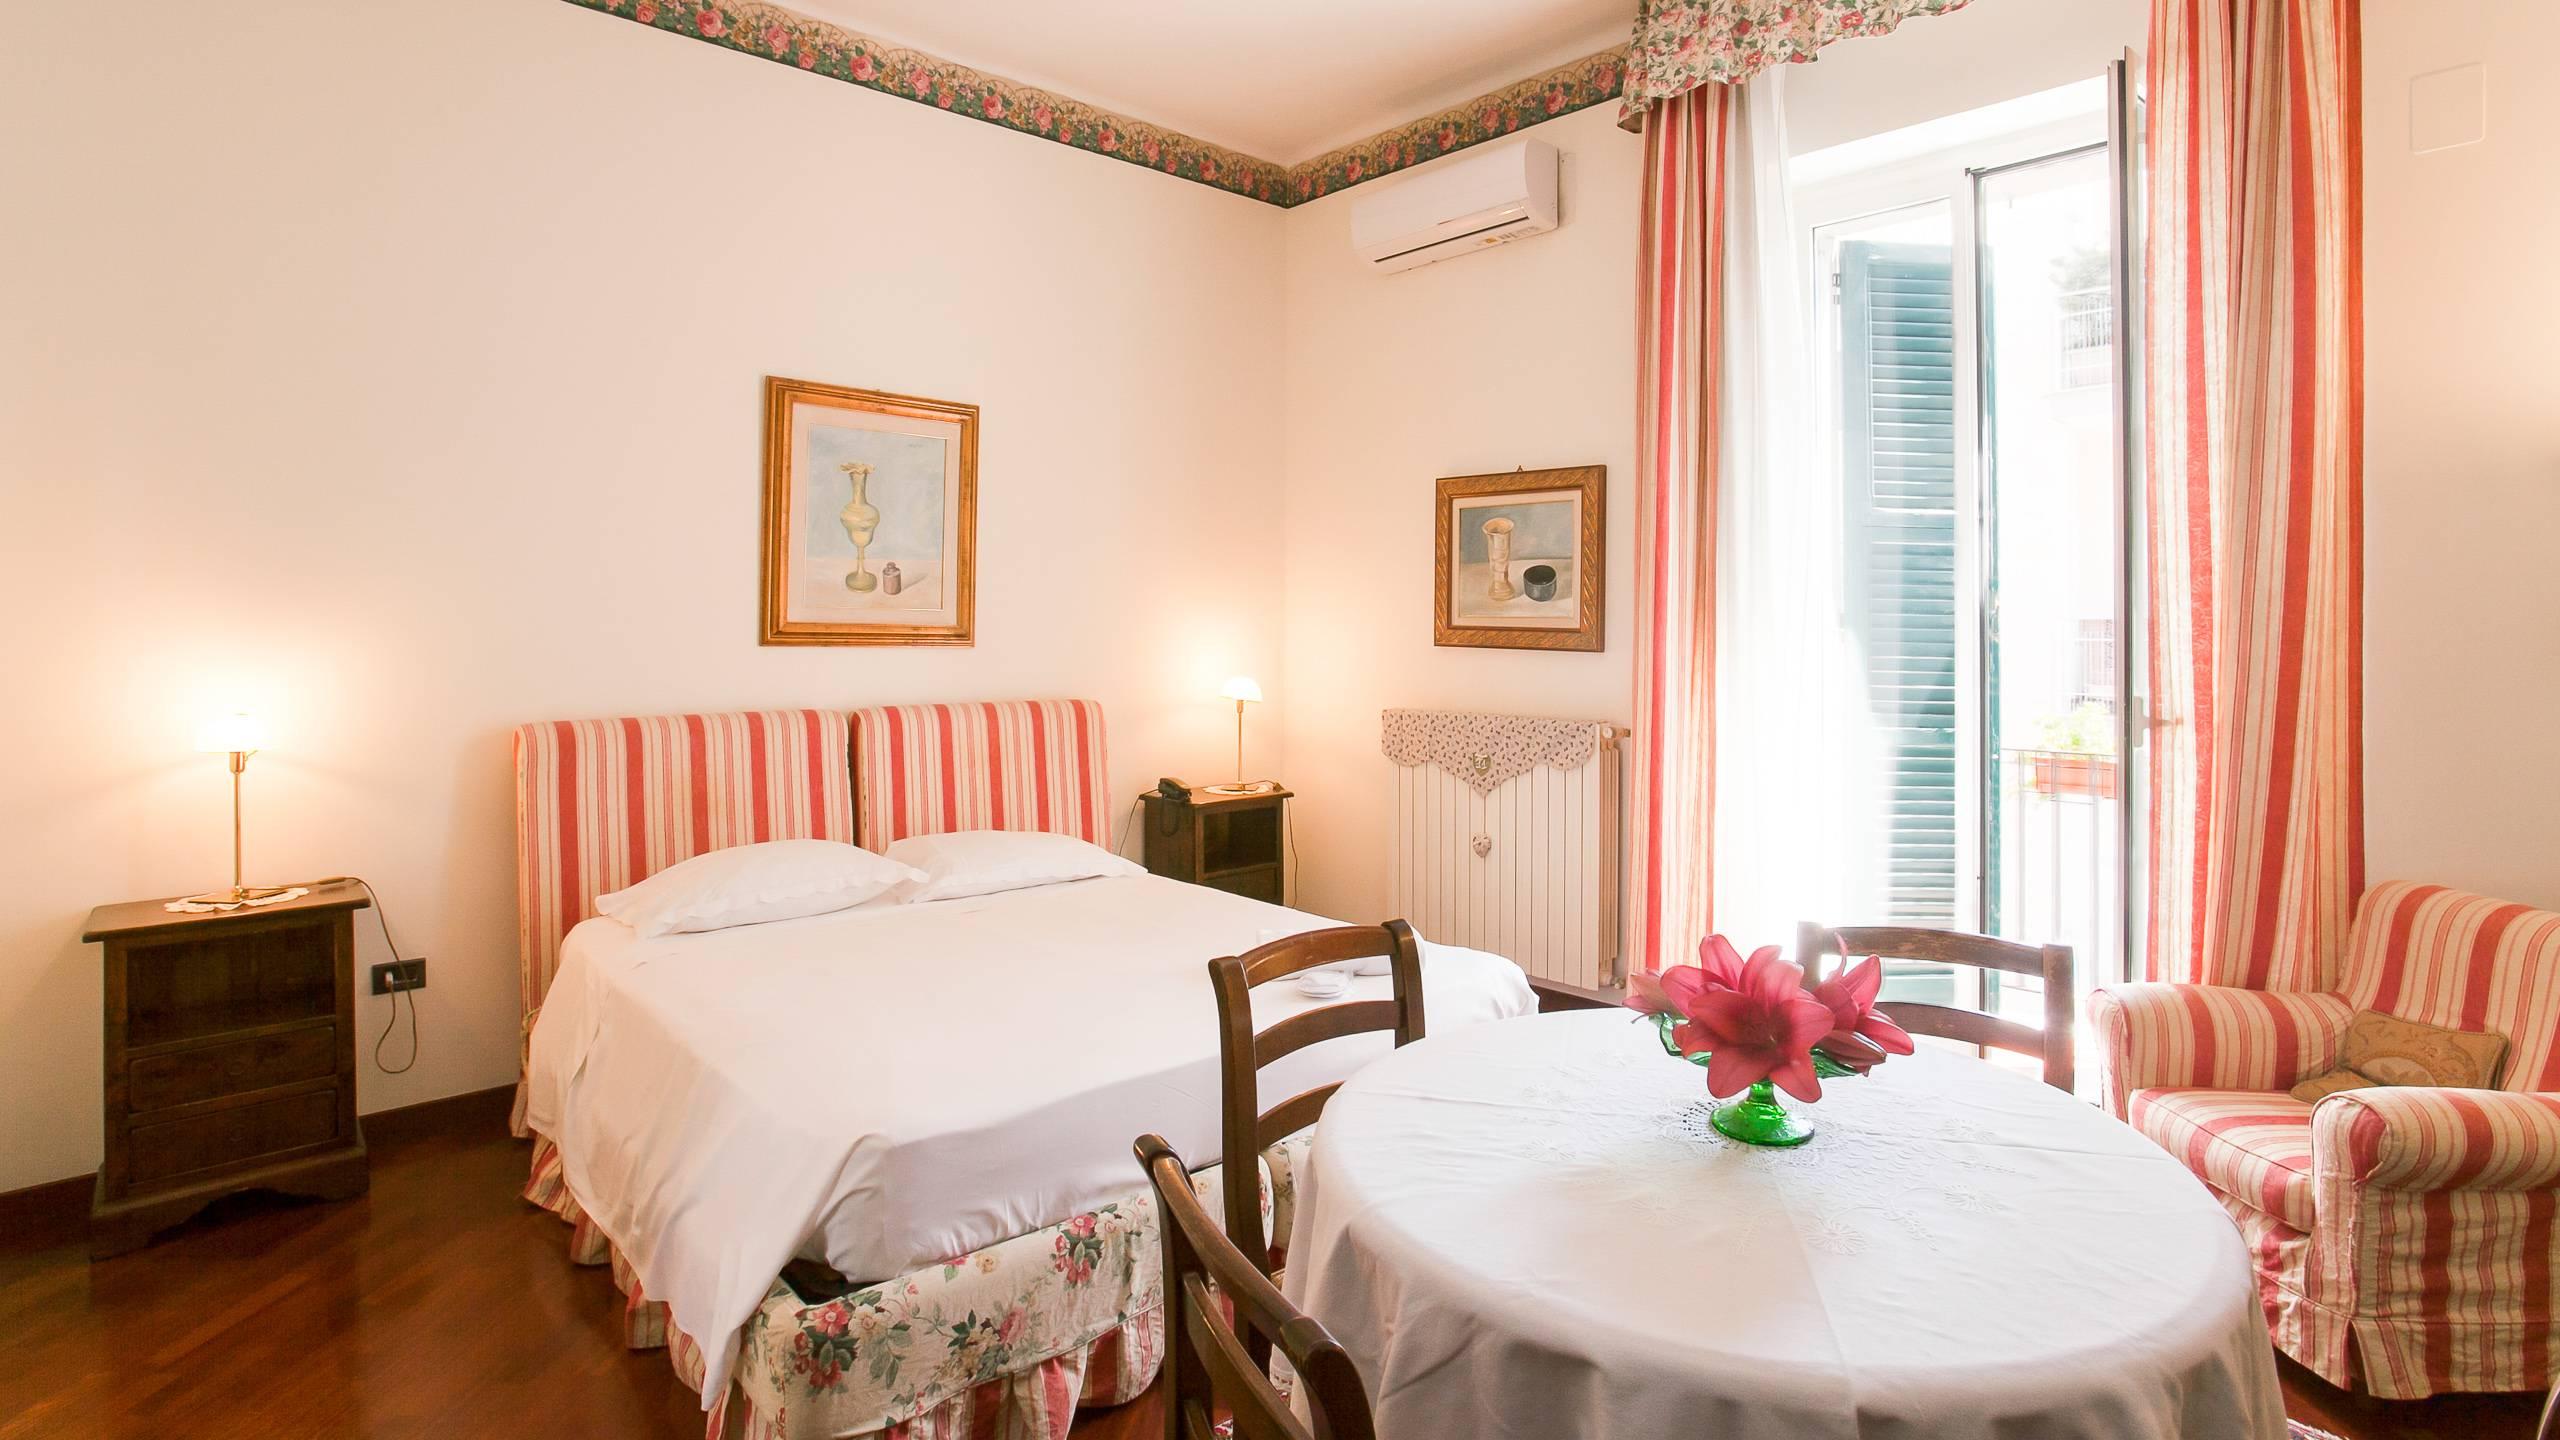 residence-zodiacus-bari-studio-flat-131